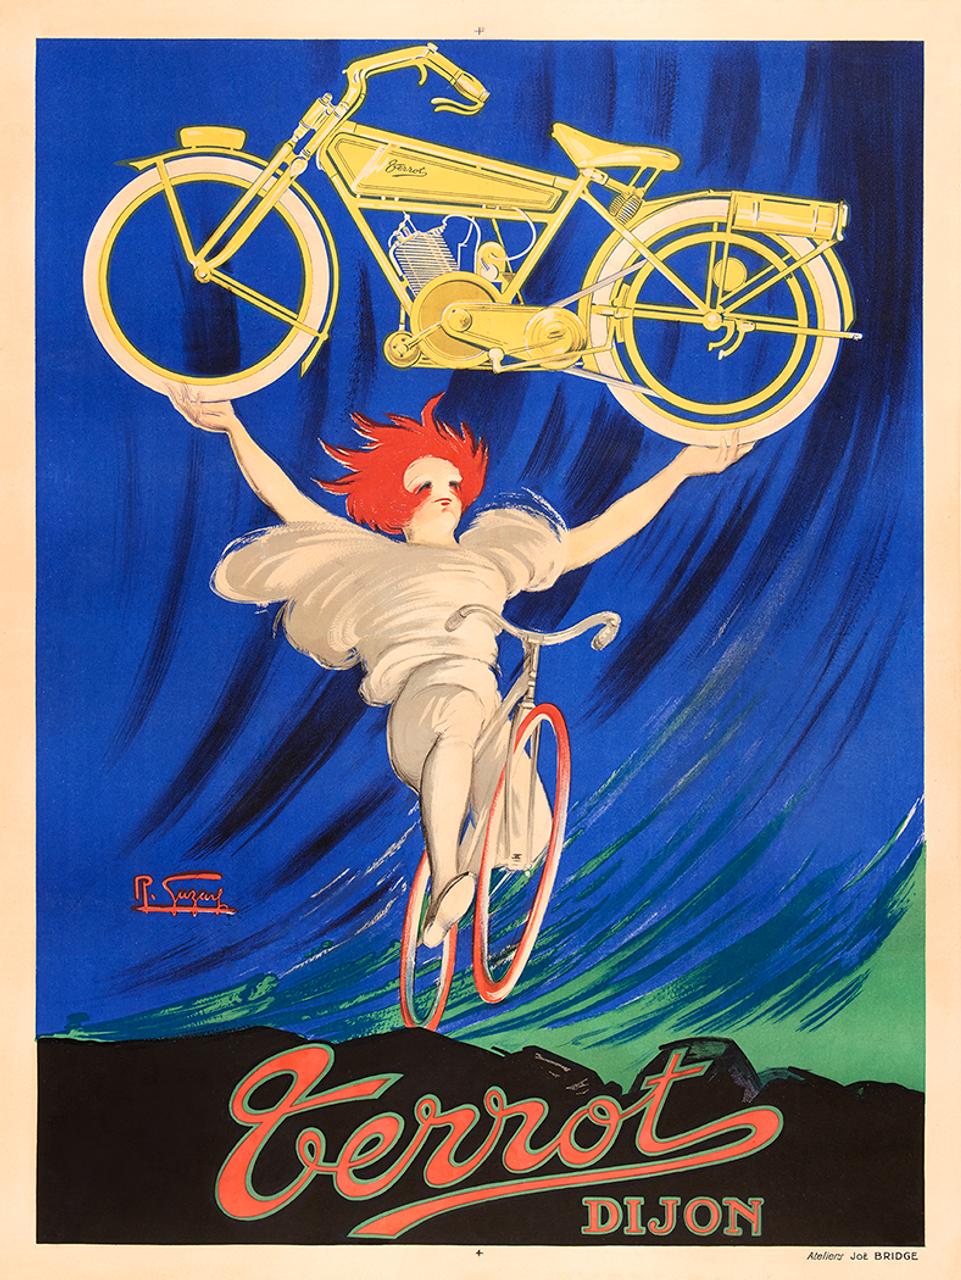 Terror Dijon Vintage Bicycle Poster by Gazay